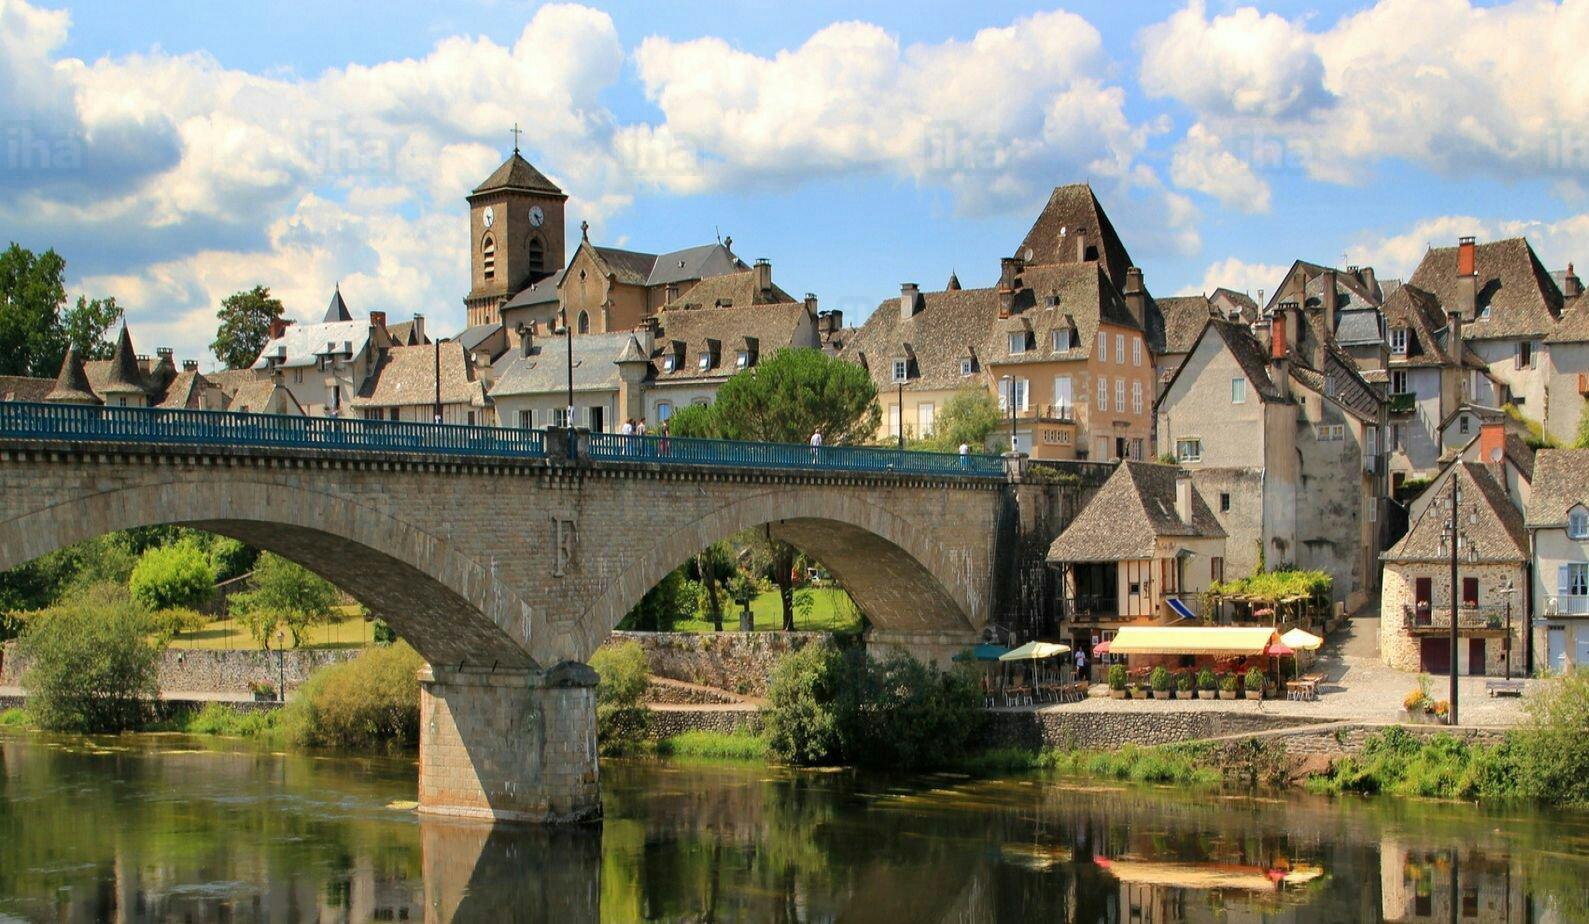 Correze-Canoe-sur-la-dordogne-a-argentat_kindlephoto-213699613.jpg